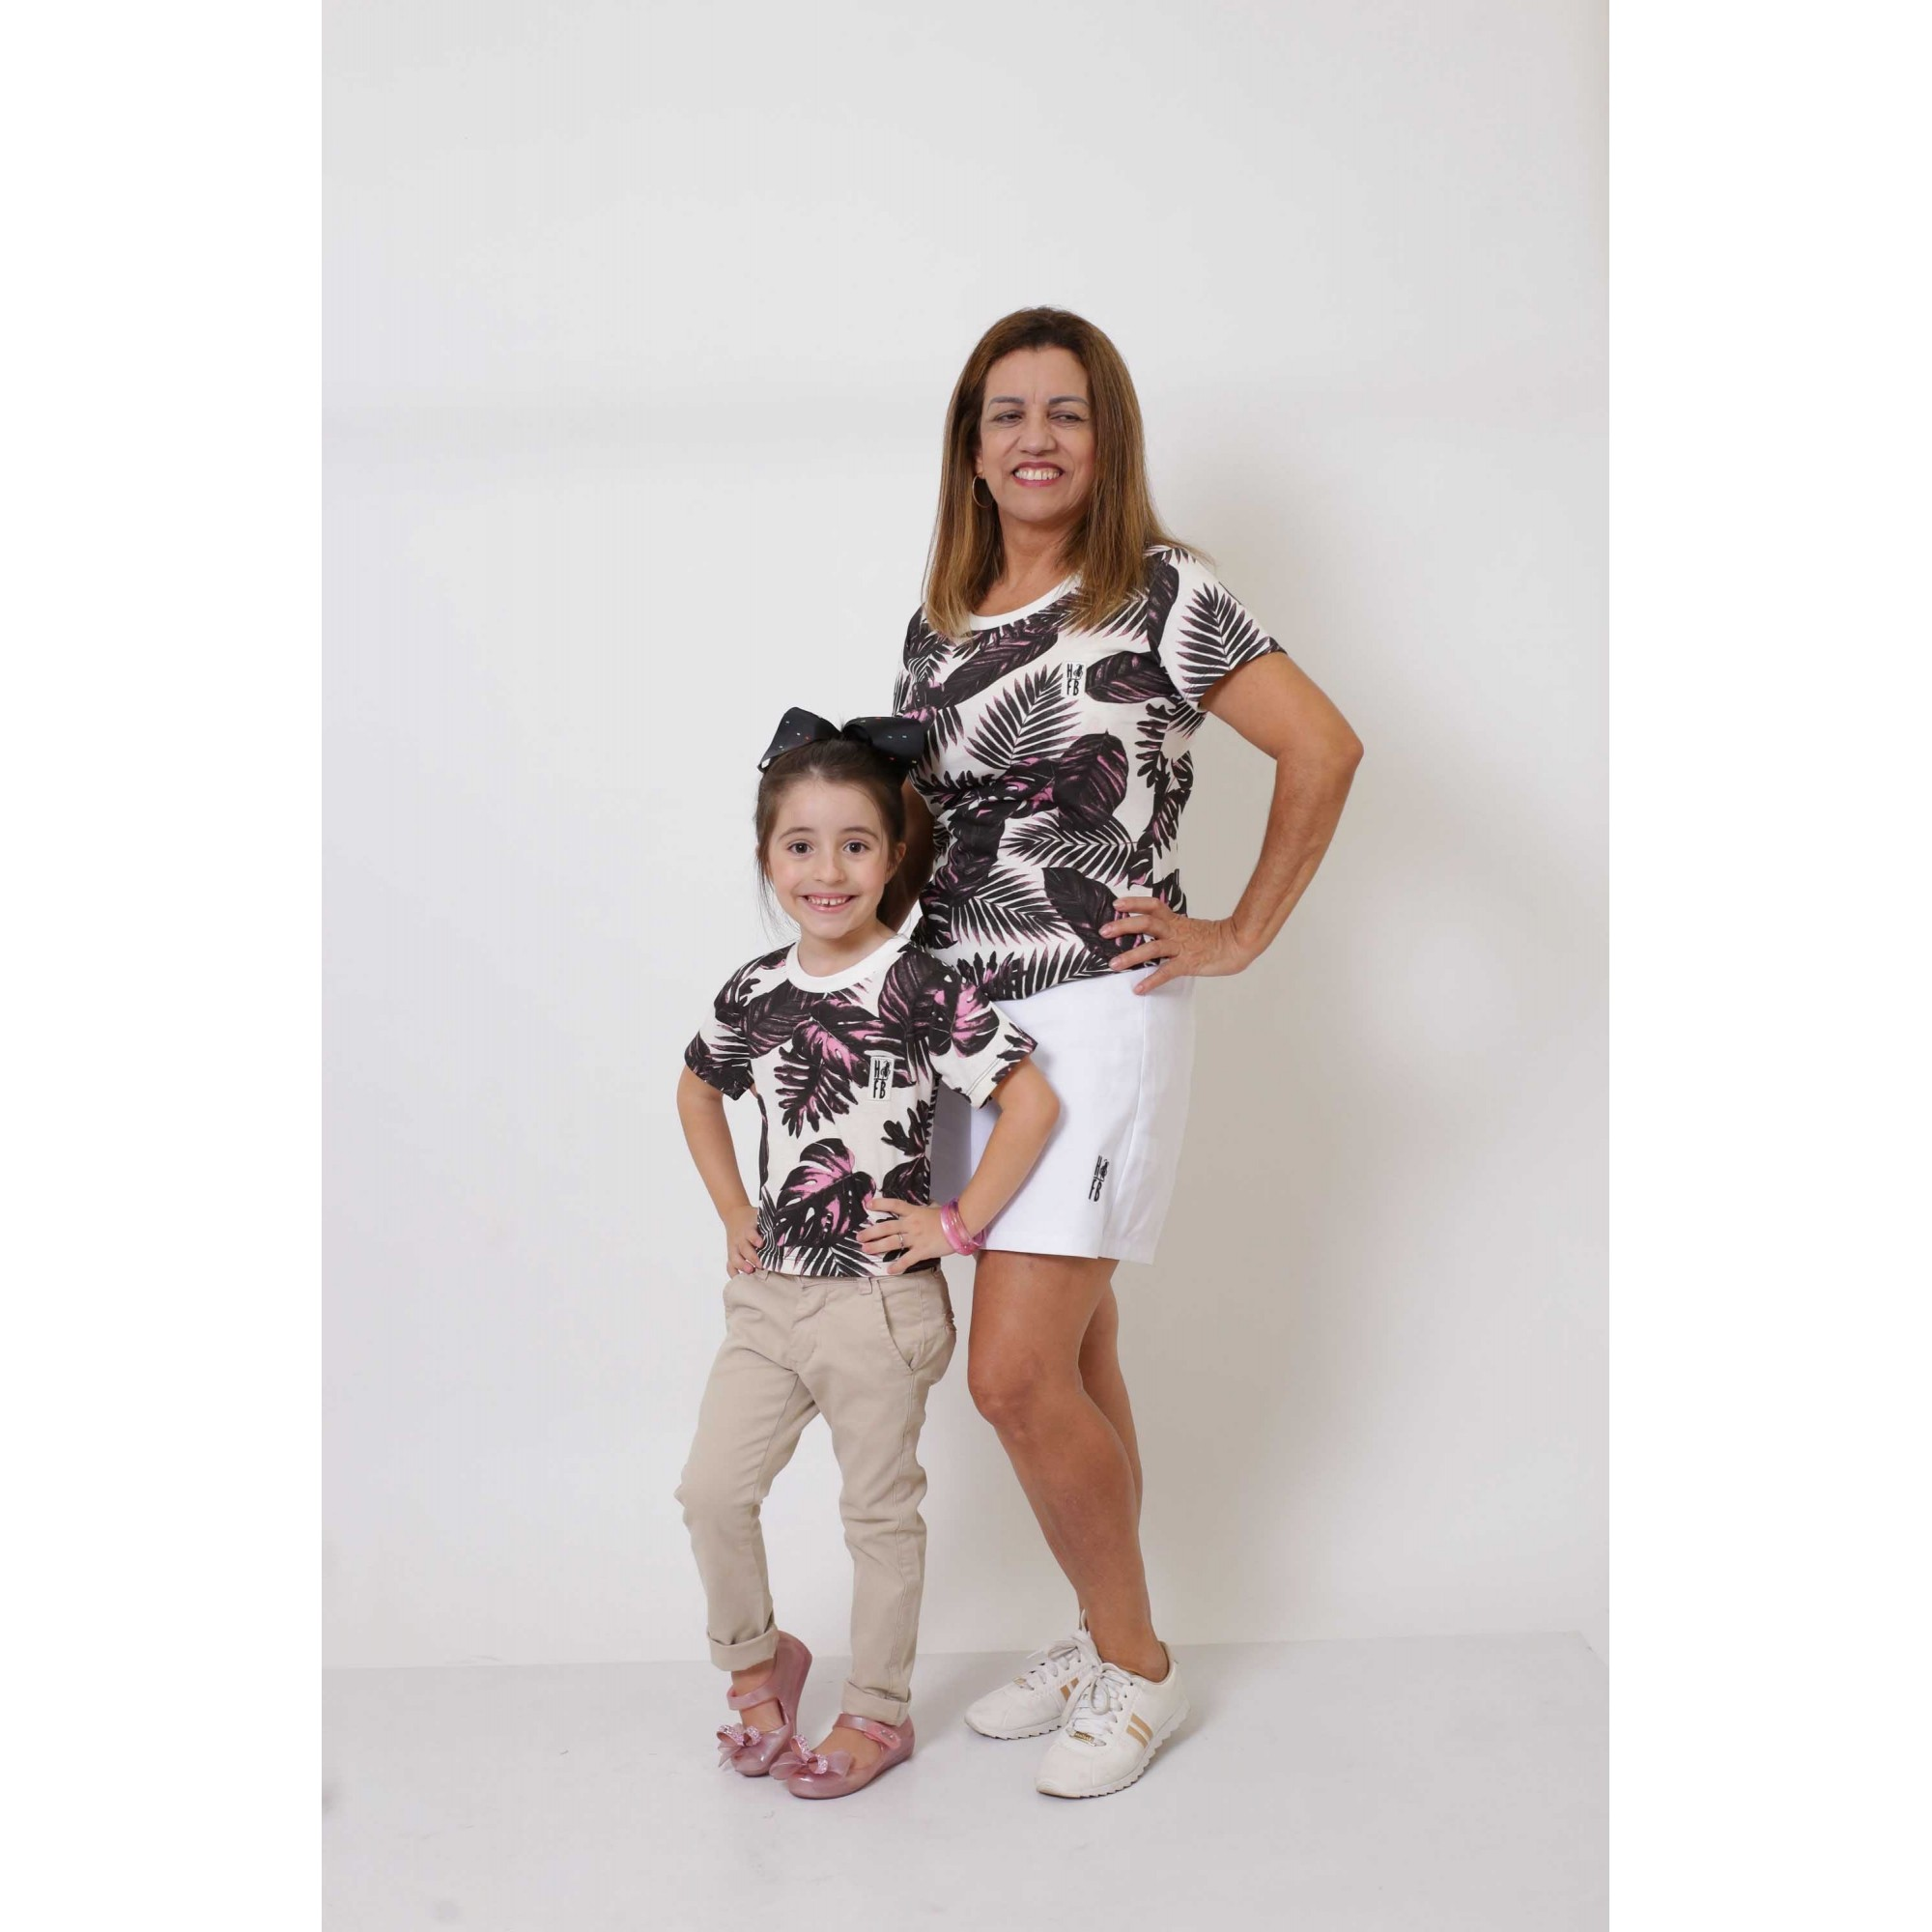 AVÓ E NETA > Kit 02 Peças T-Shirts - Cancún [Coleção Tal Avó Tal Neta]  - Heitor Fashion Brazil